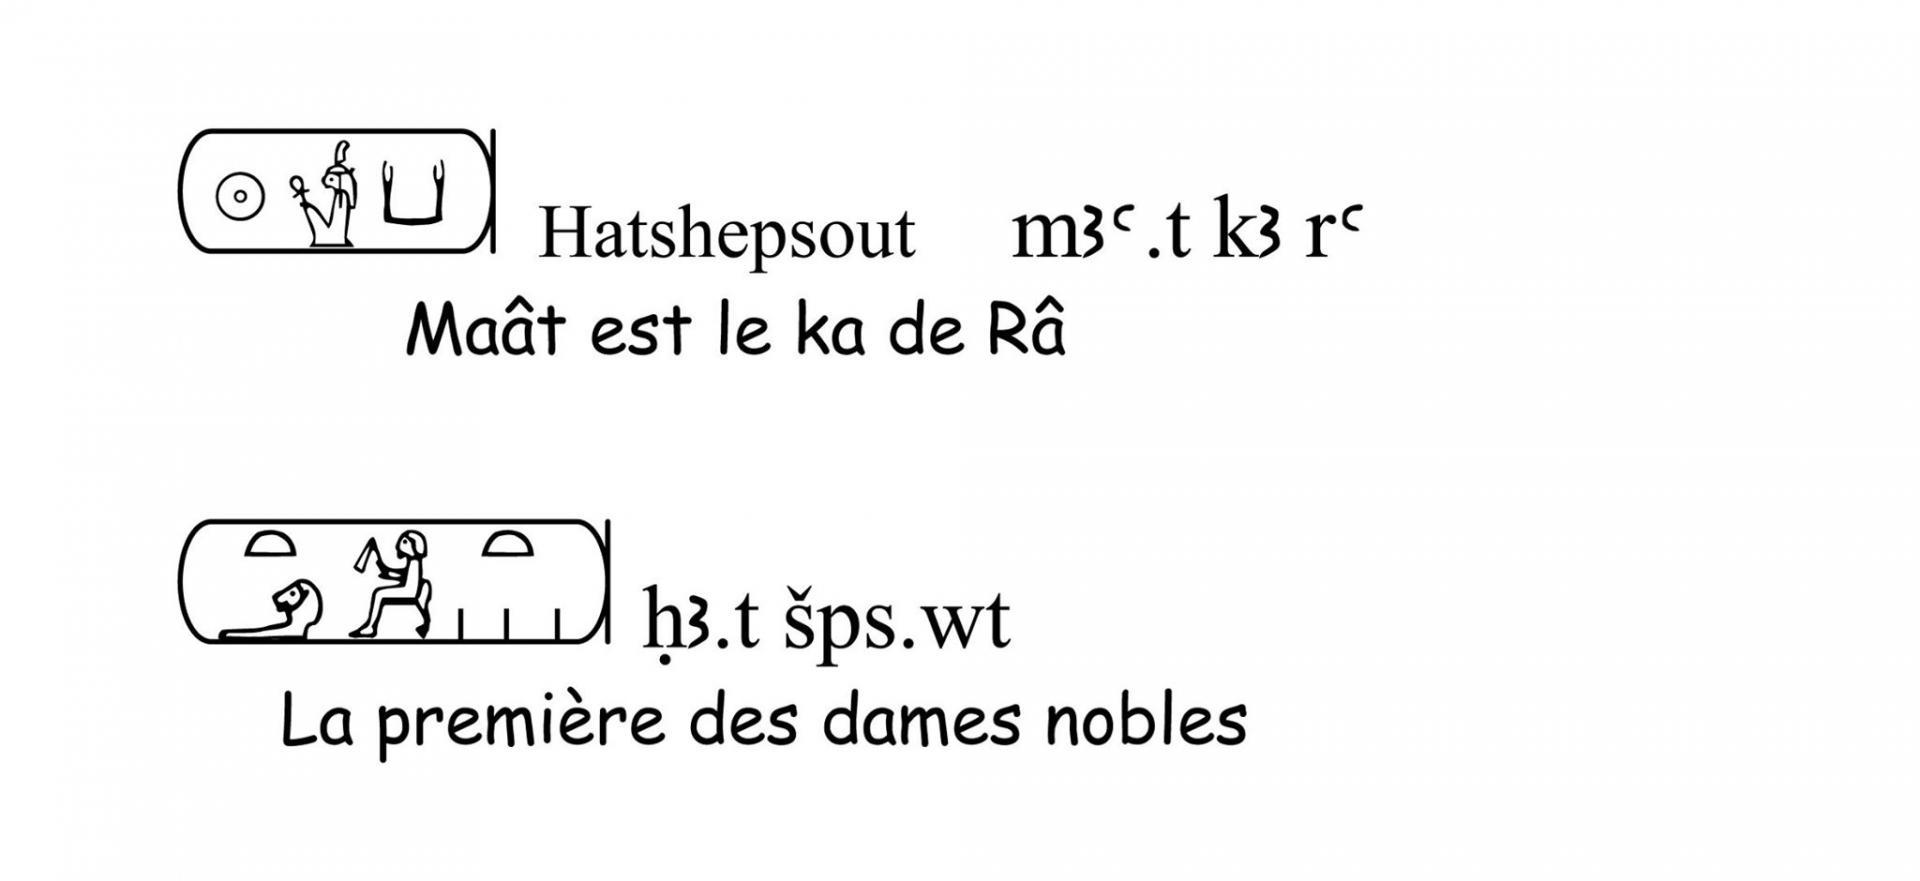 Imhotep egyptologie